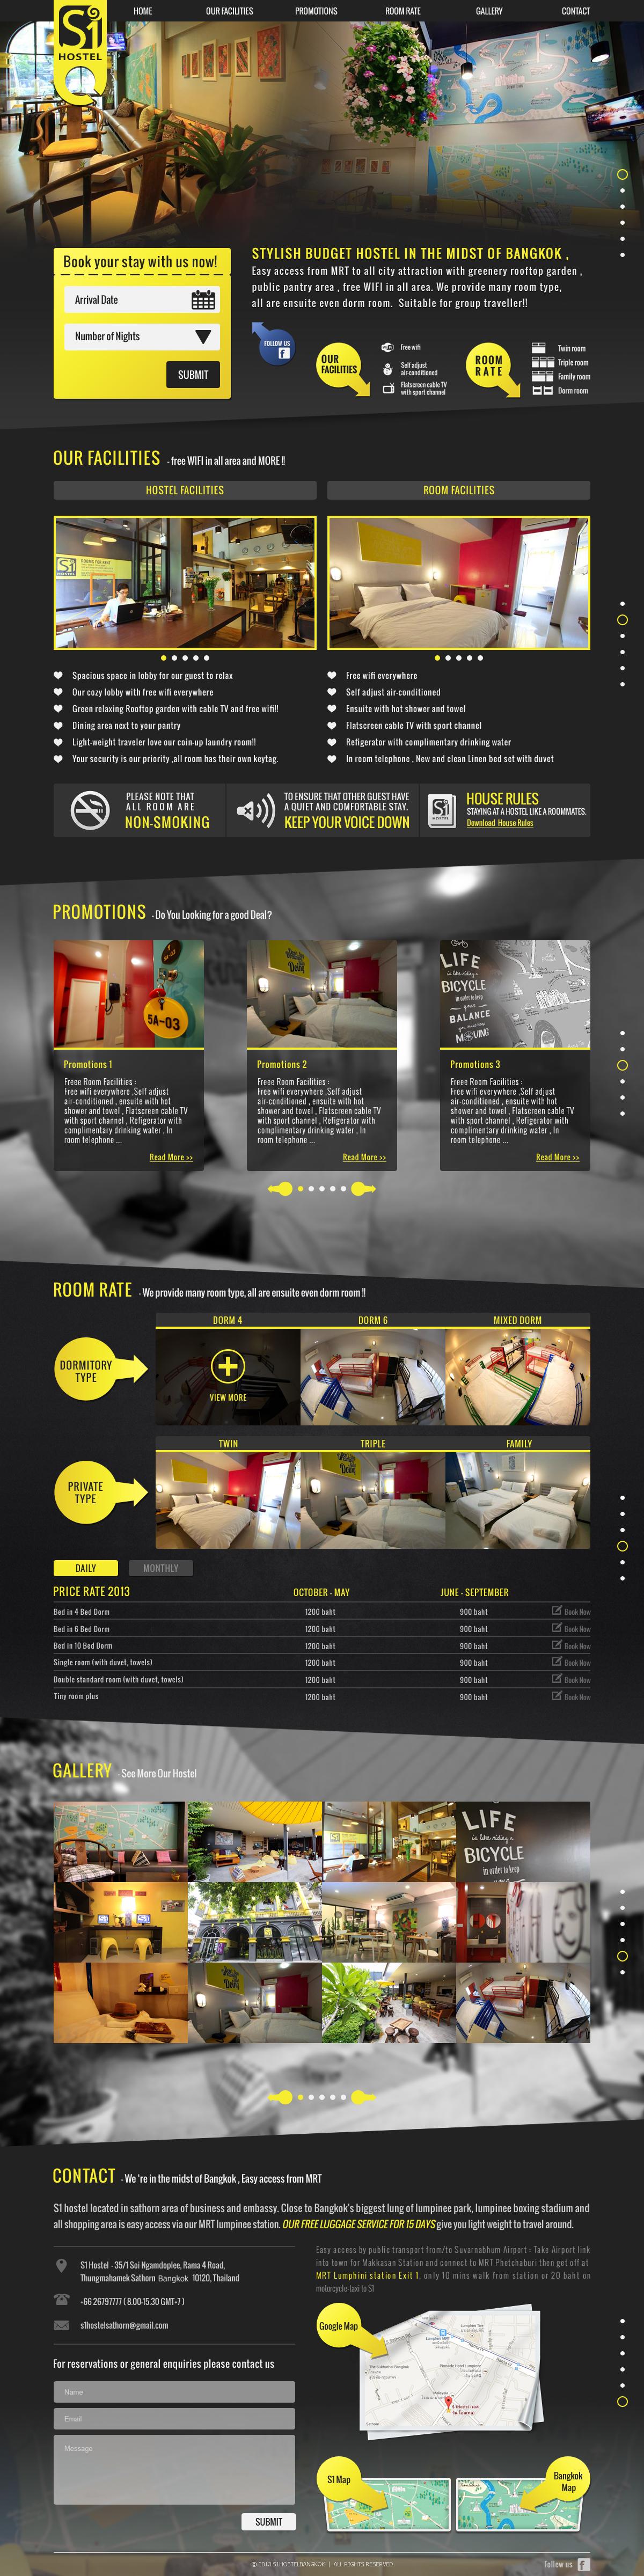 Hostel Website Web Development Design Web Inspiration Web Design